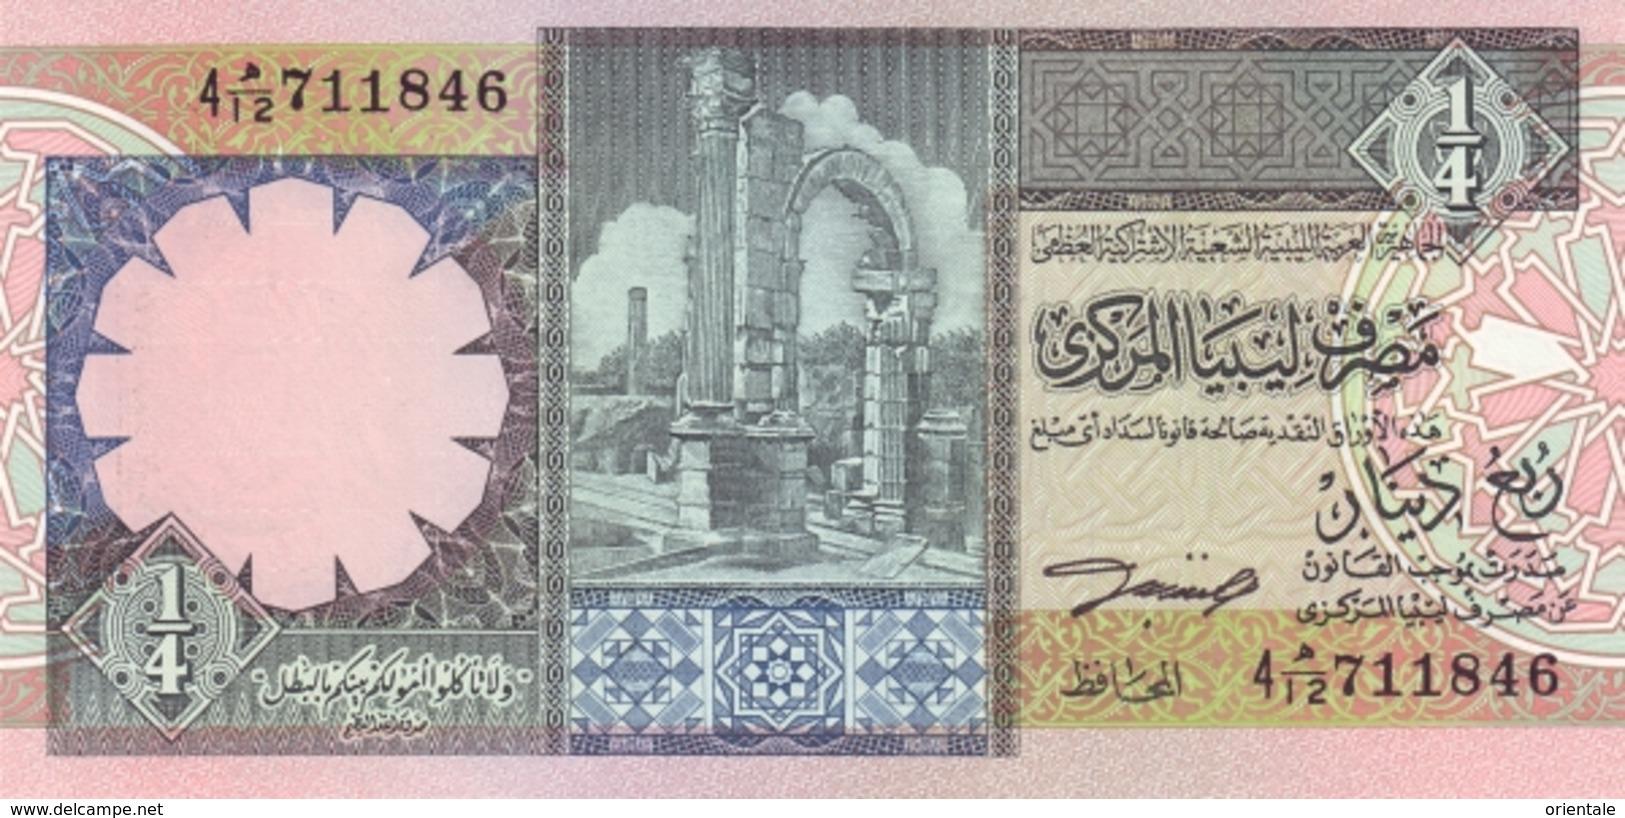 LIBYA P. 57b 1/4 D 1991  UNC - Libye